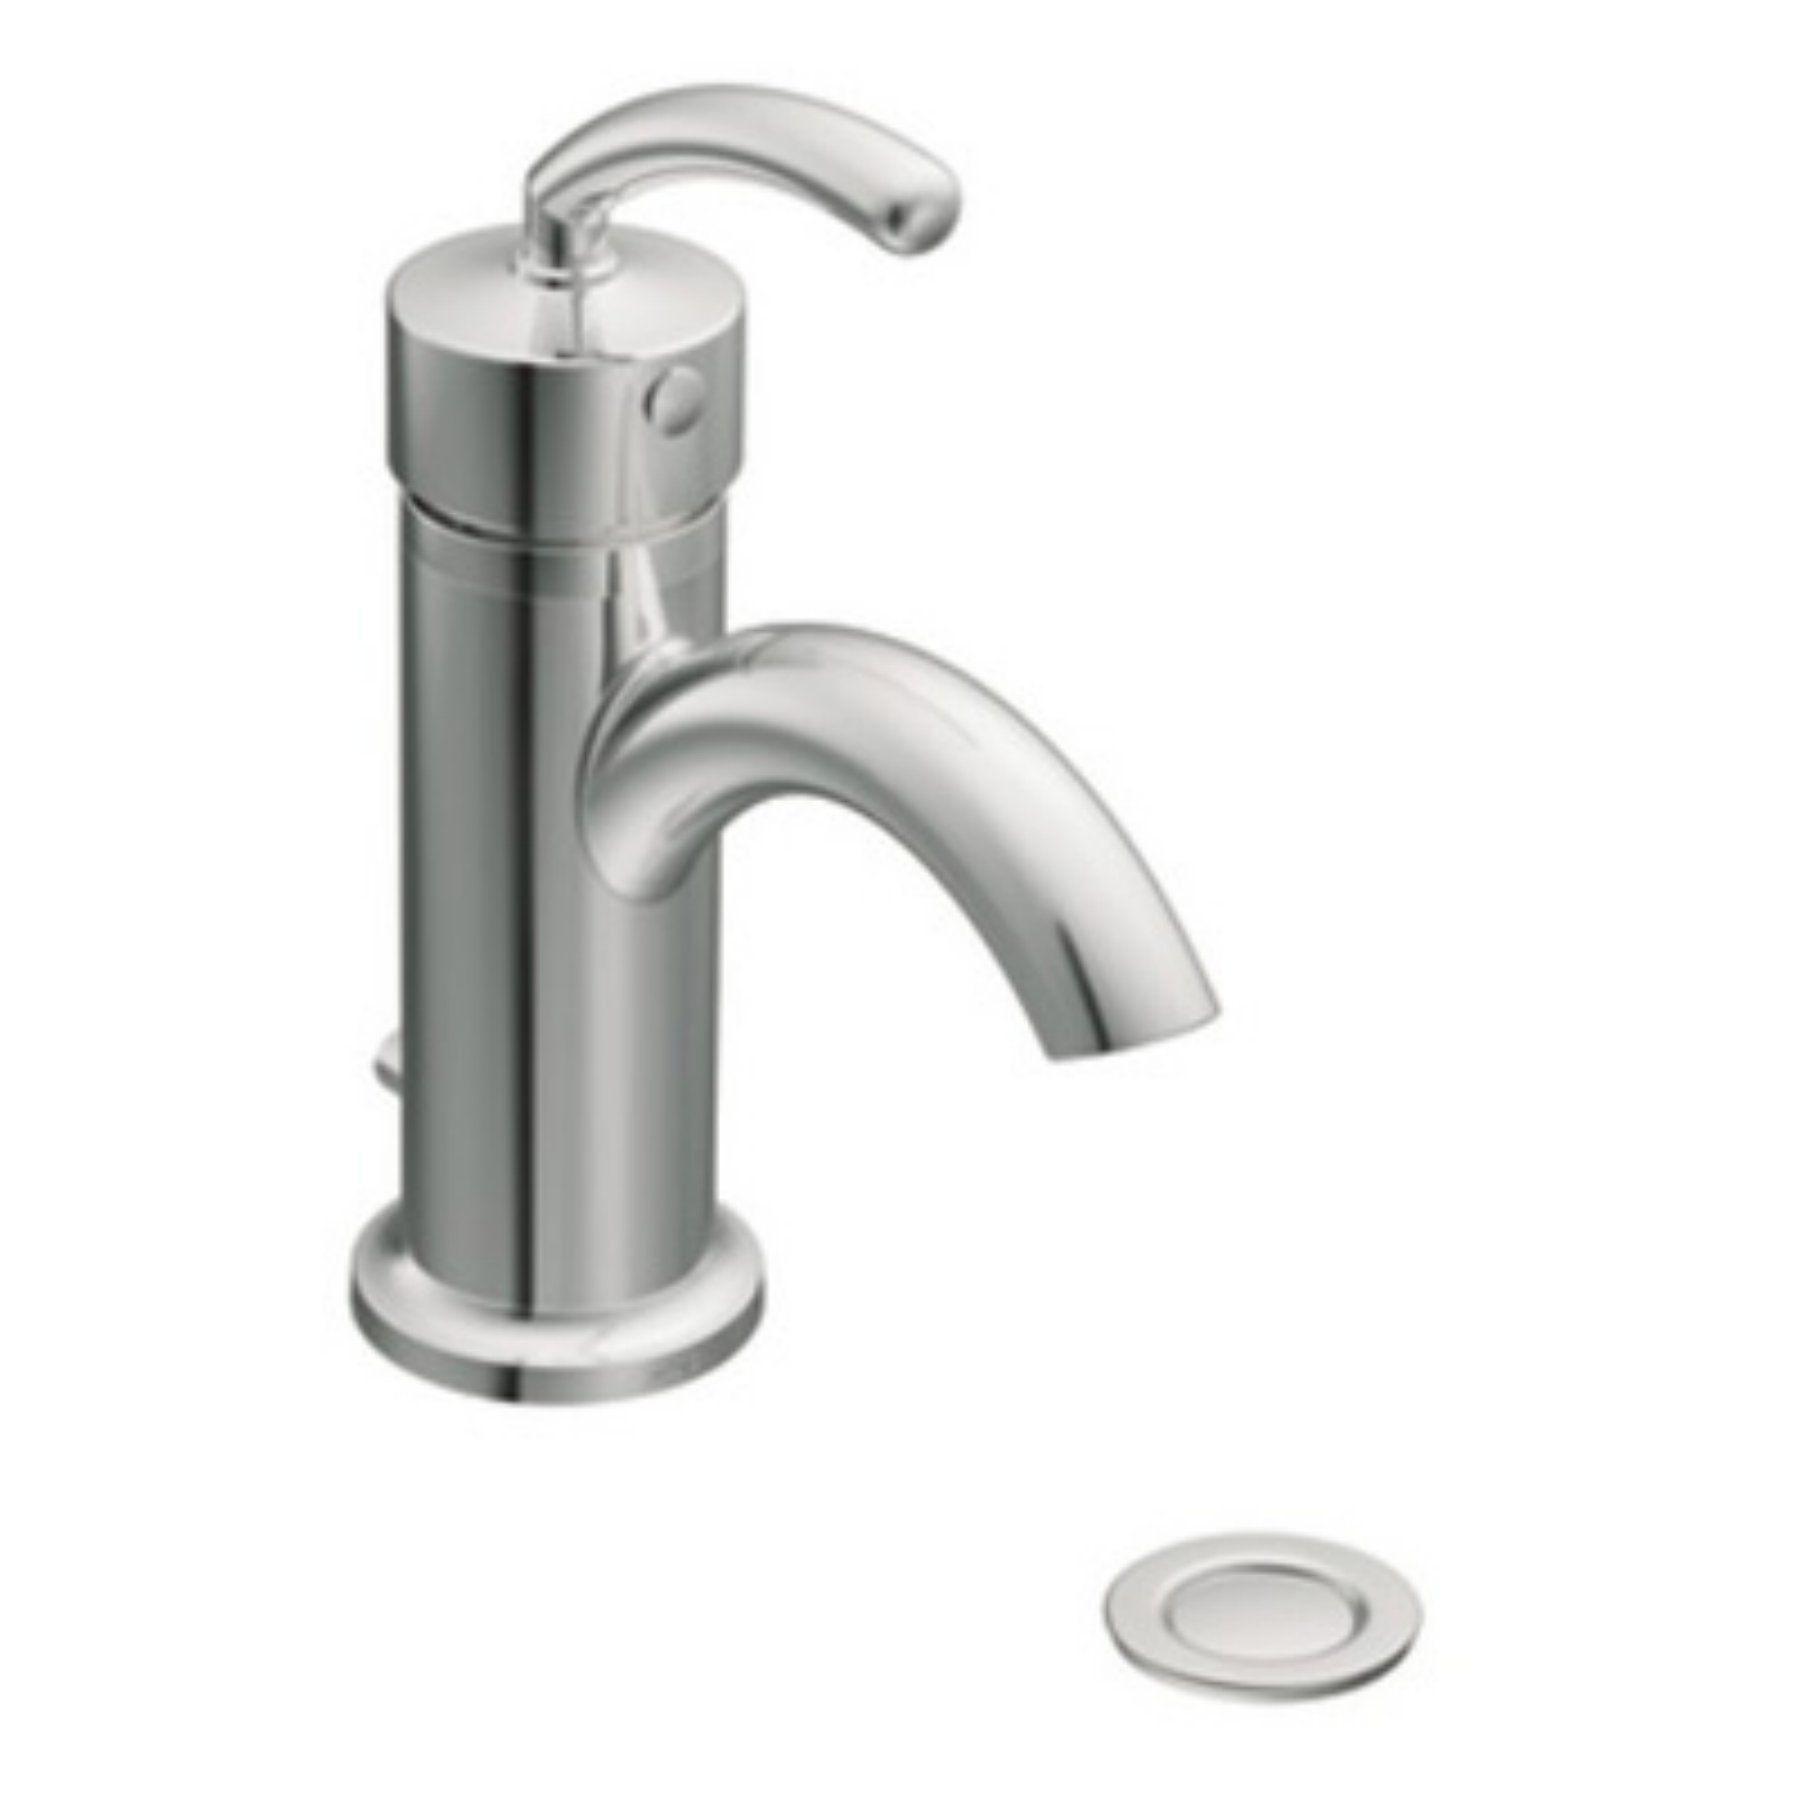 Moen Icon S6500 Single Hole Bathroom Sink Faucet Ms6500bn